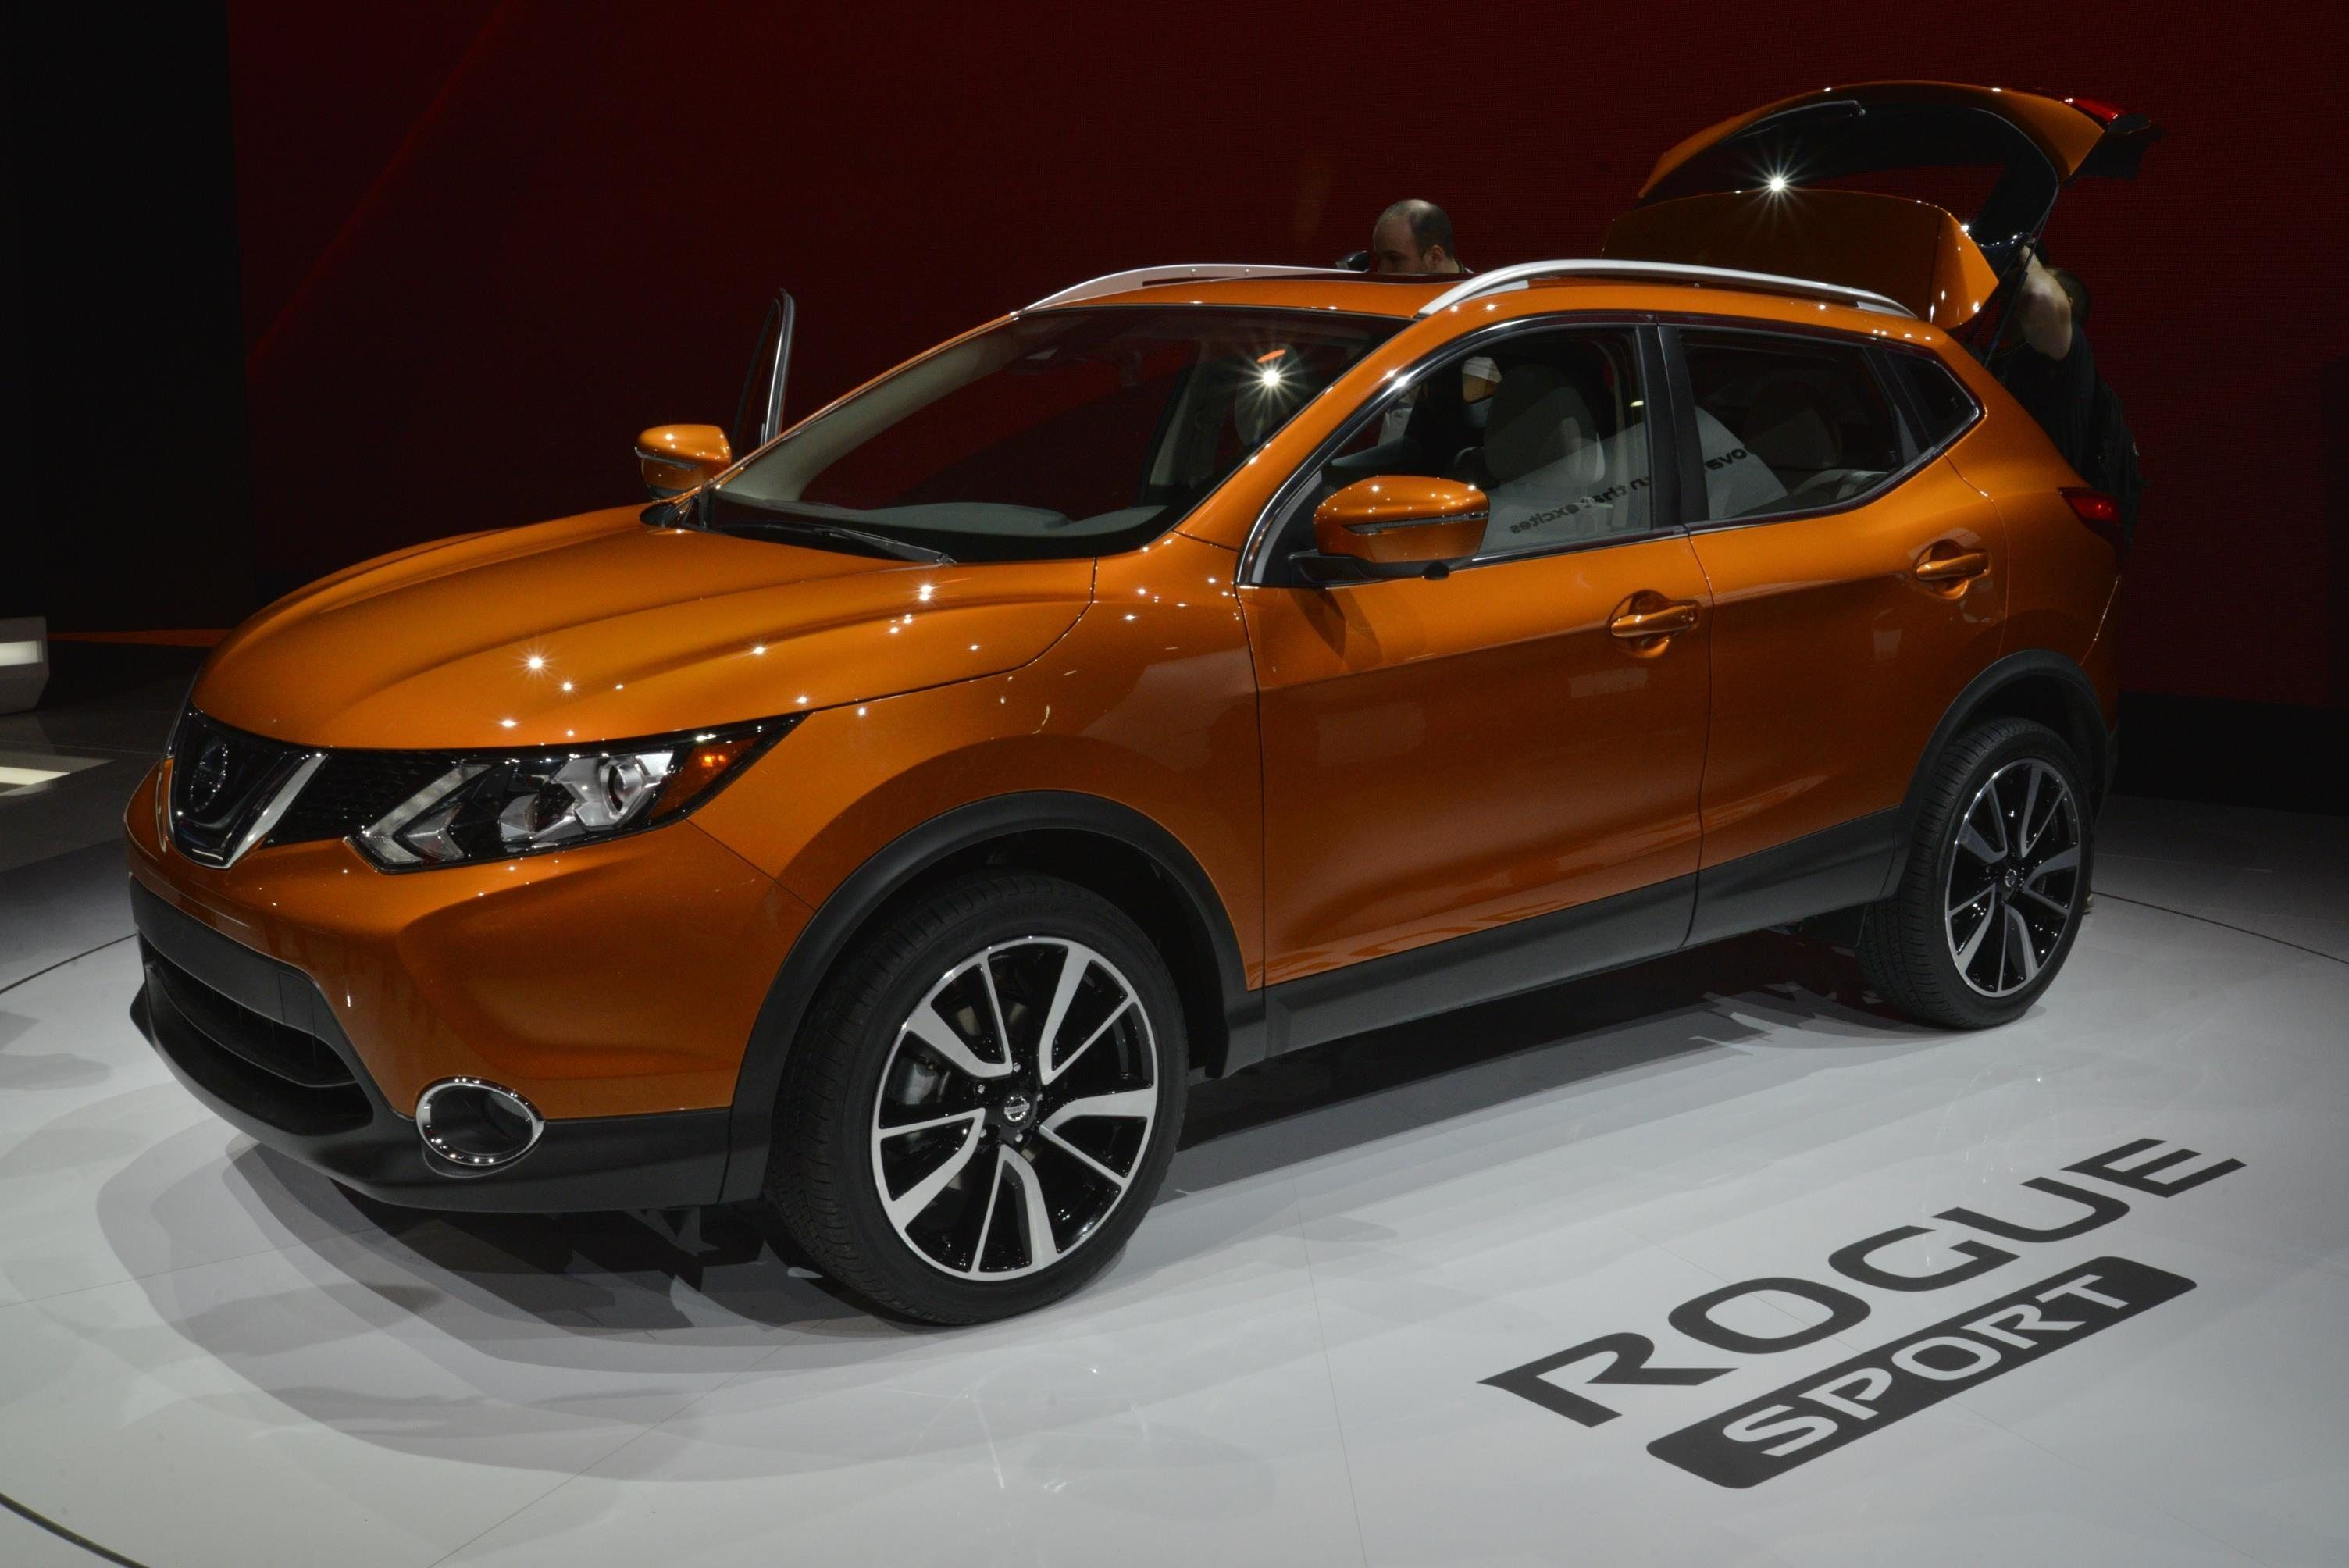 2020 Nissan Rogue Price Nissan Rogue Nissan Rogues